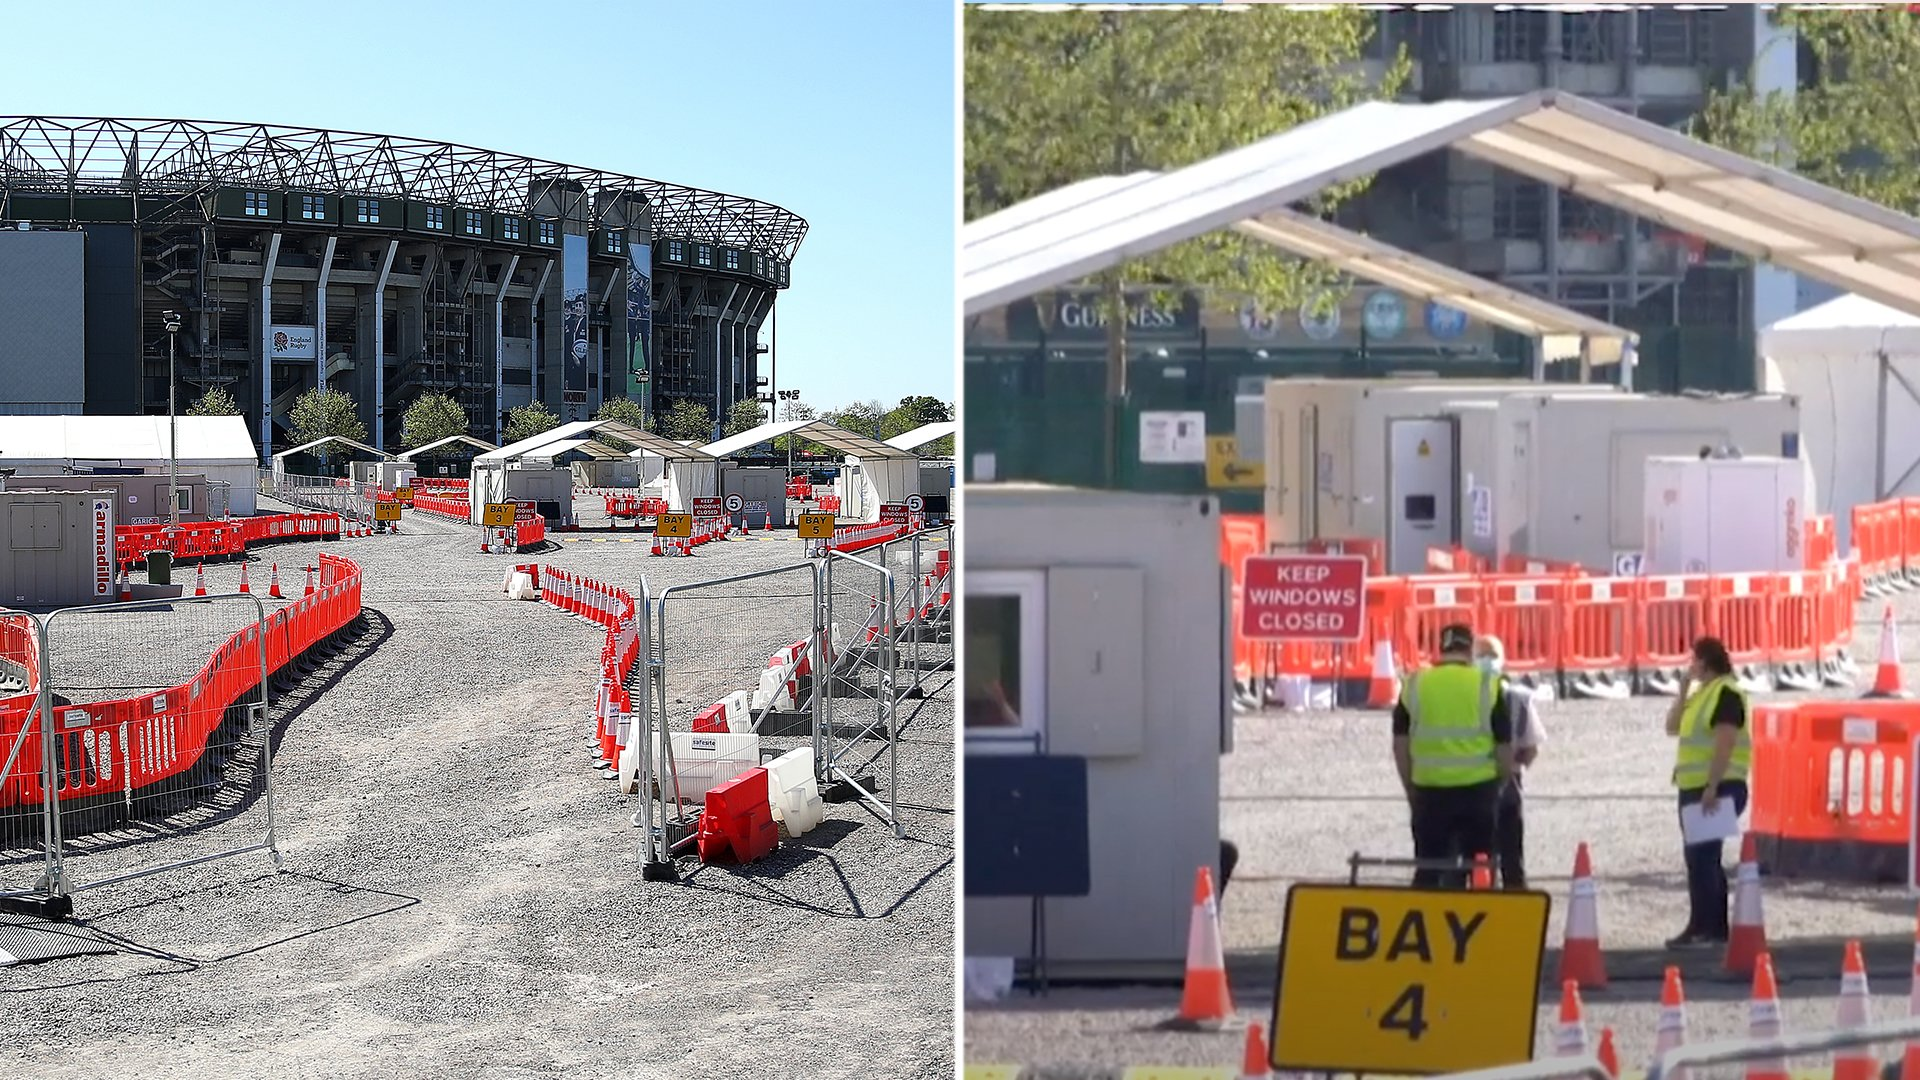 Eerie new video shows how Twickenham stadium has been transformed in London